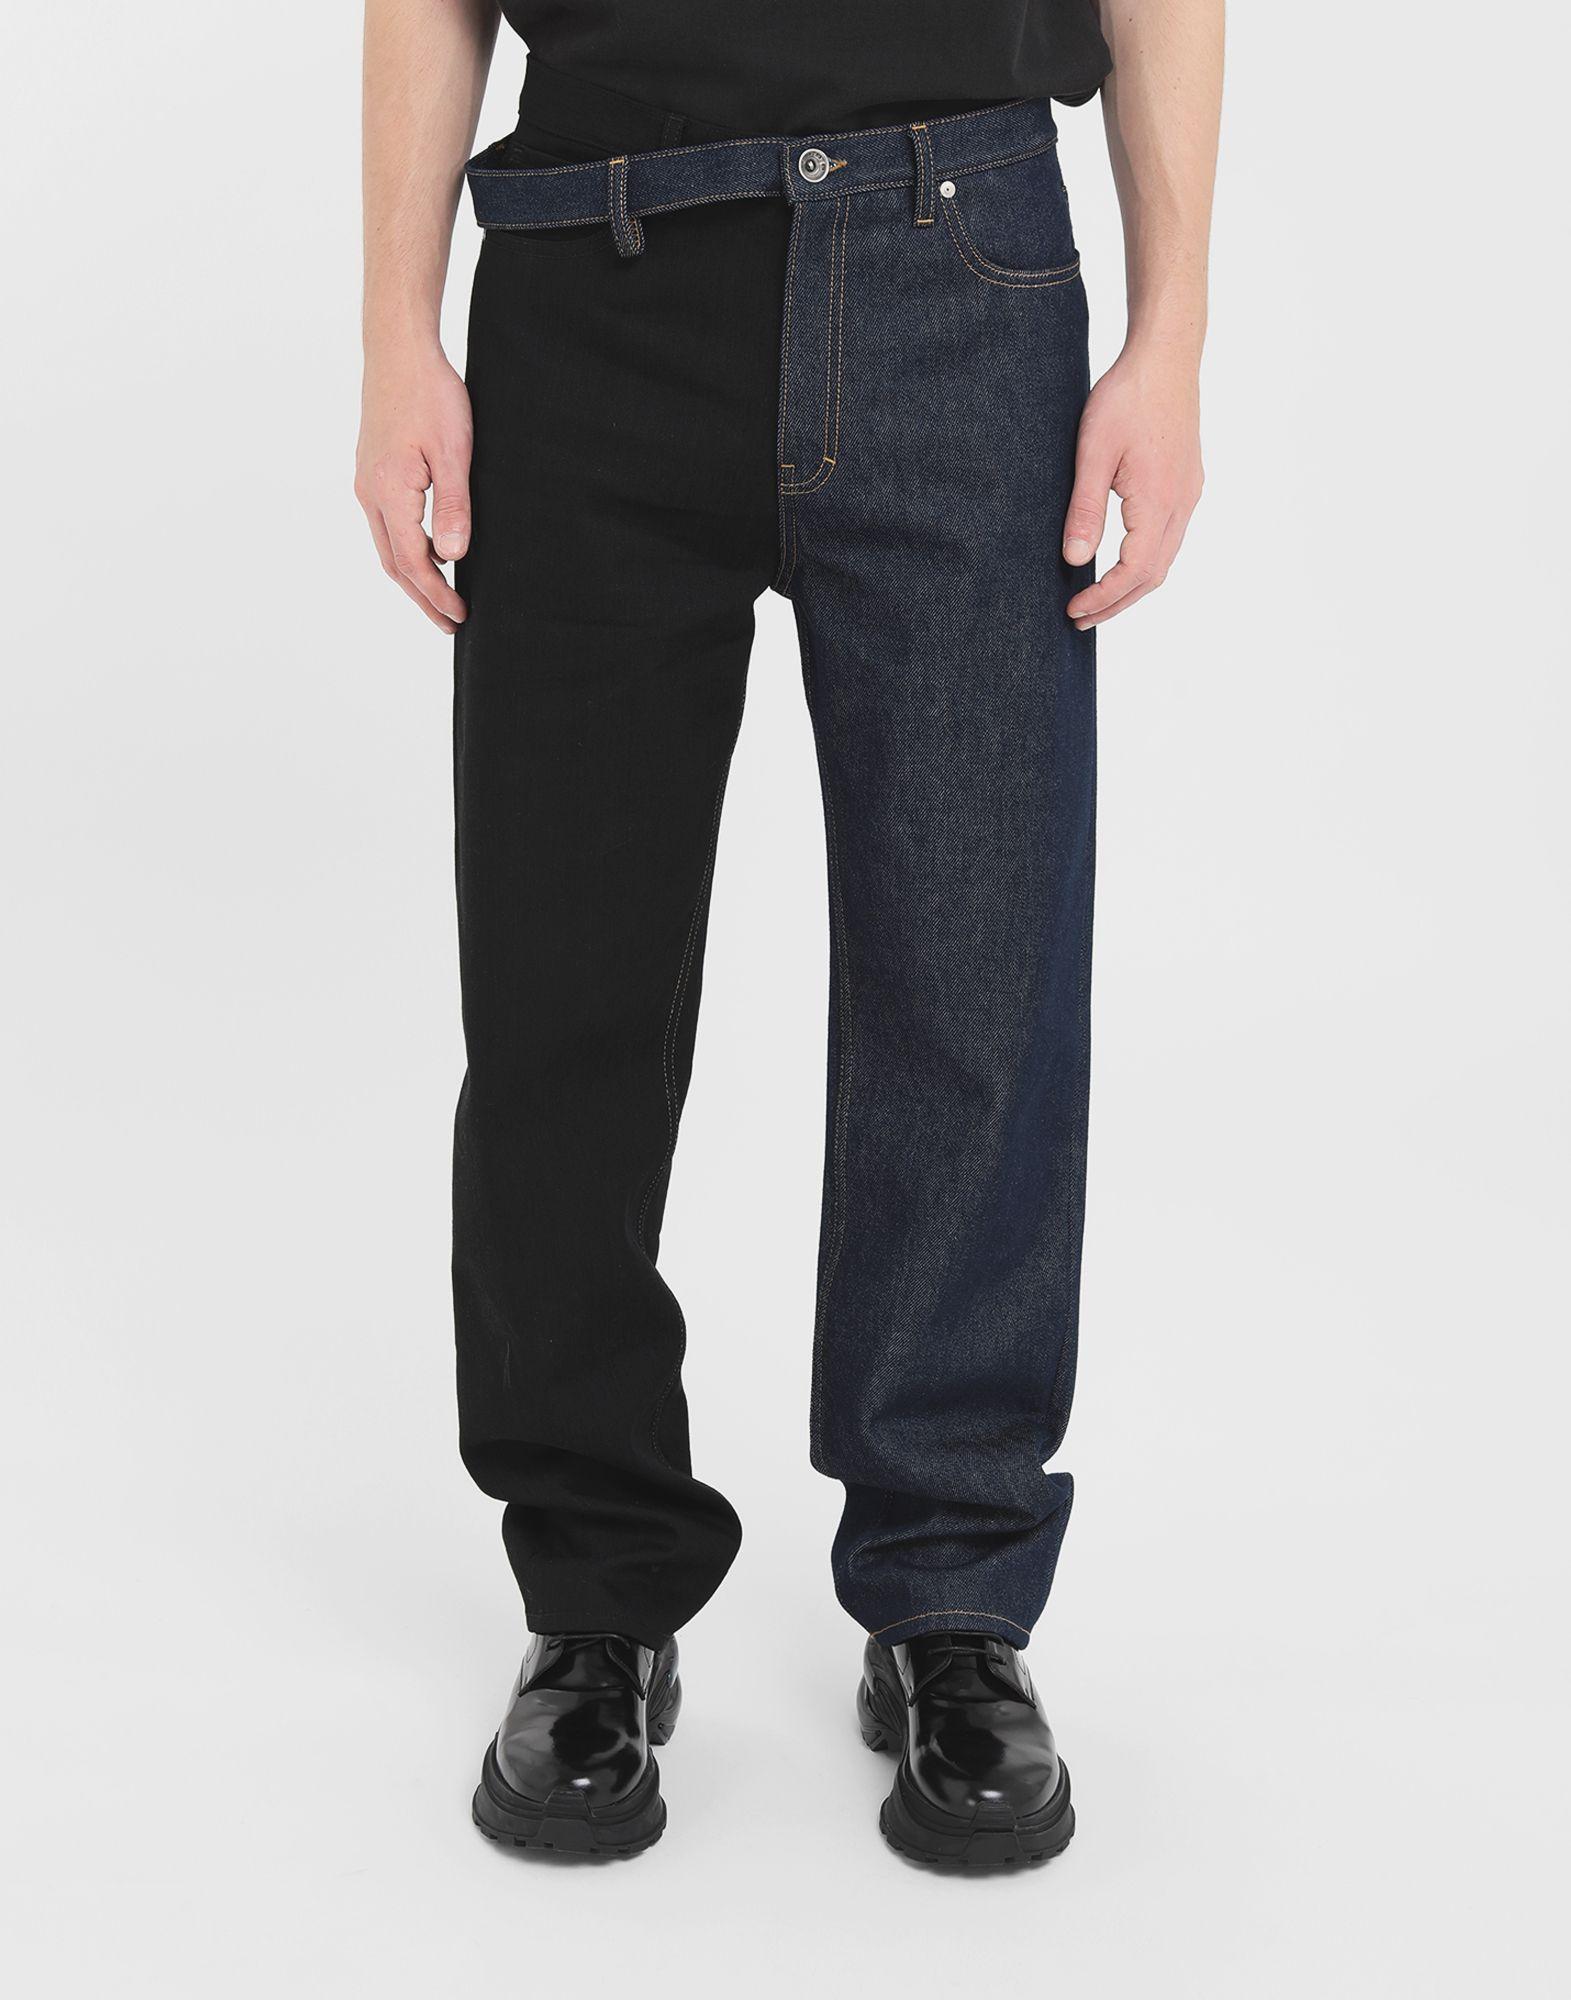 MAISON MARGIELA Spliced jeans Jeans Man r